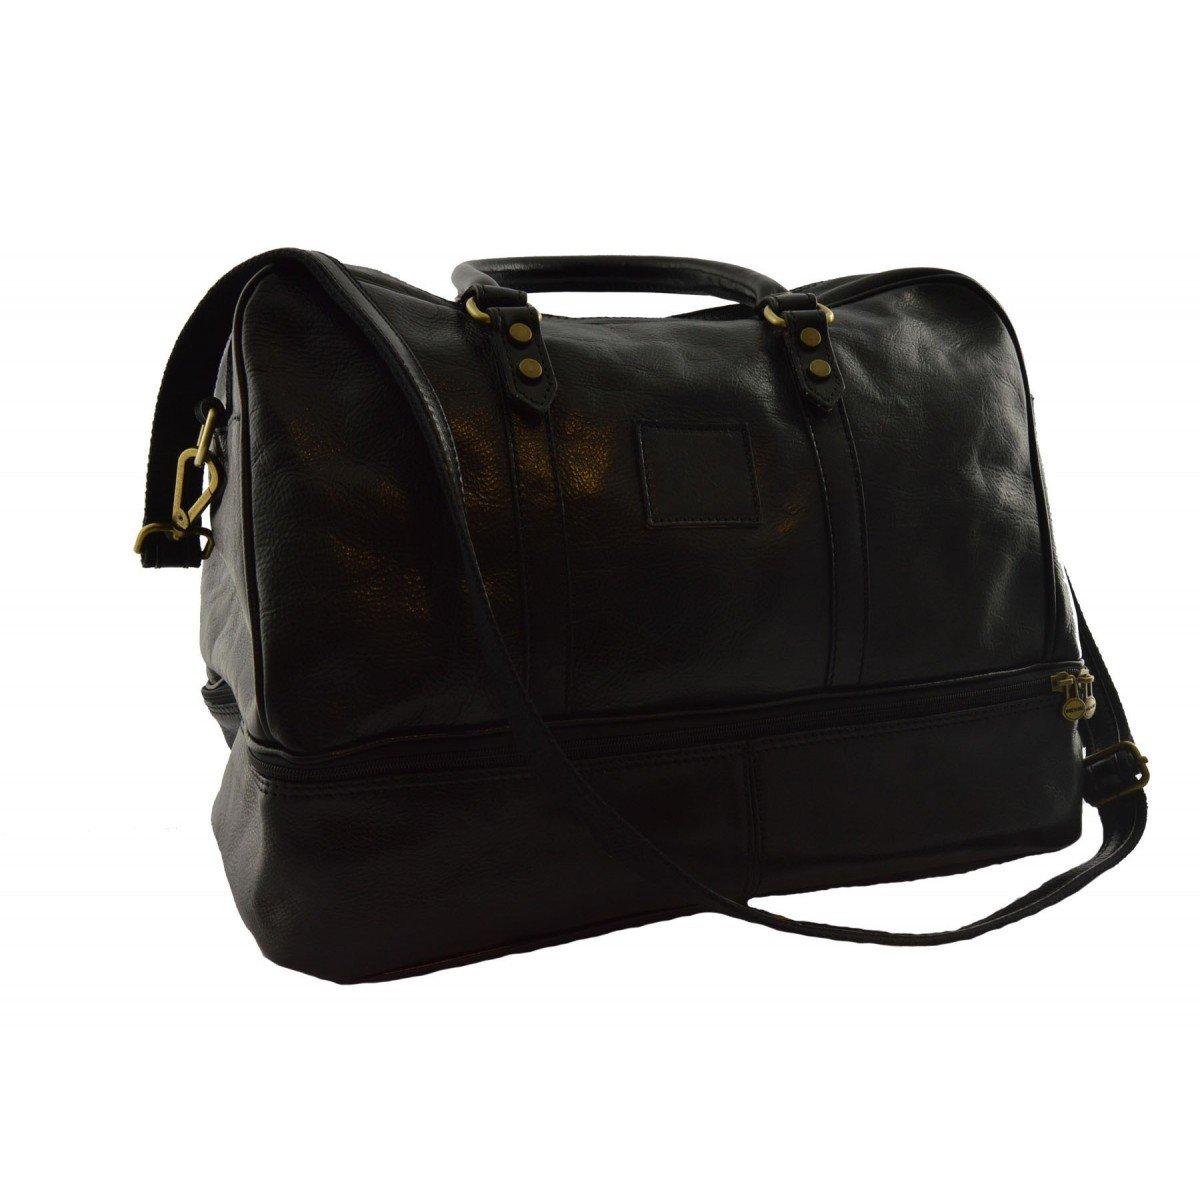 Made In Italy Leather Travel Bag Color Black - Travel Bag B014T6HPSK